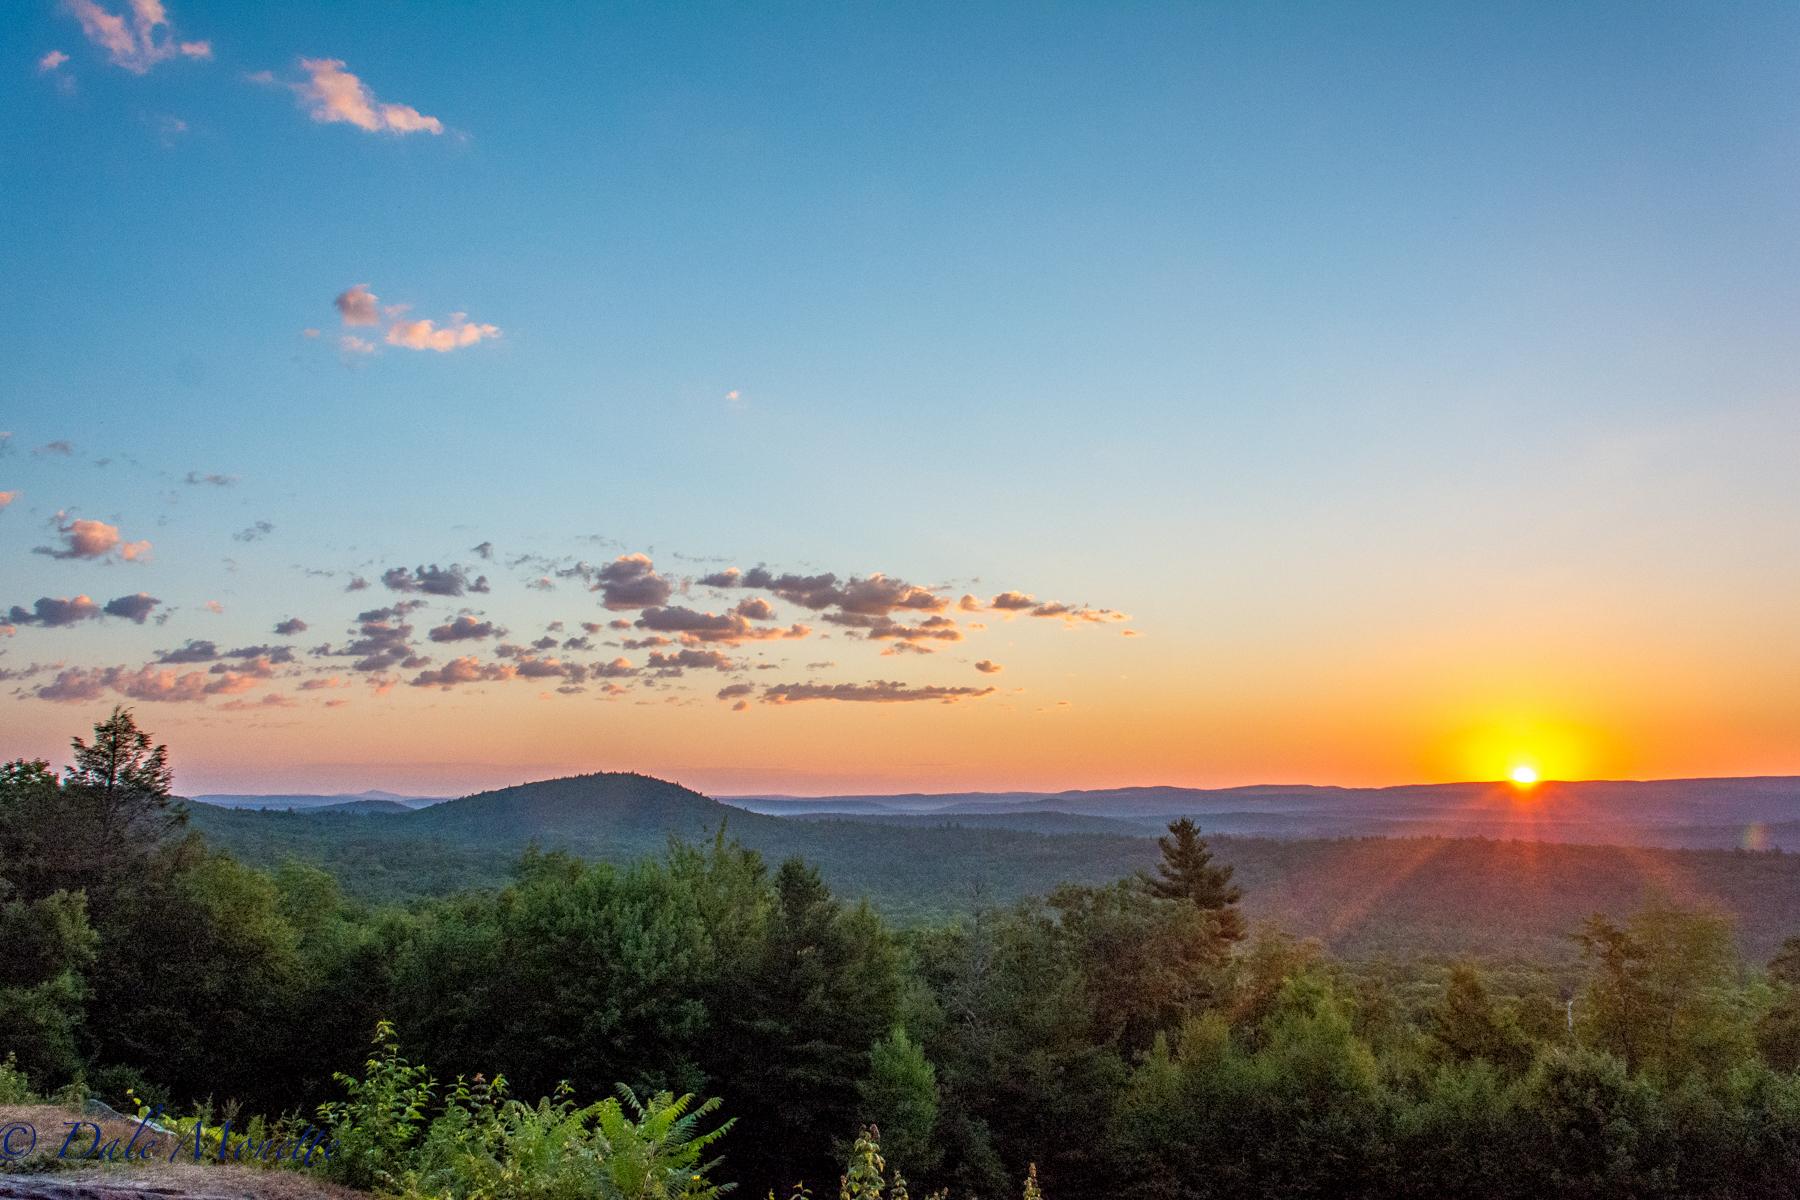 A hot summer sunrise from New Salem looking over north Quabbin. 7/23/16